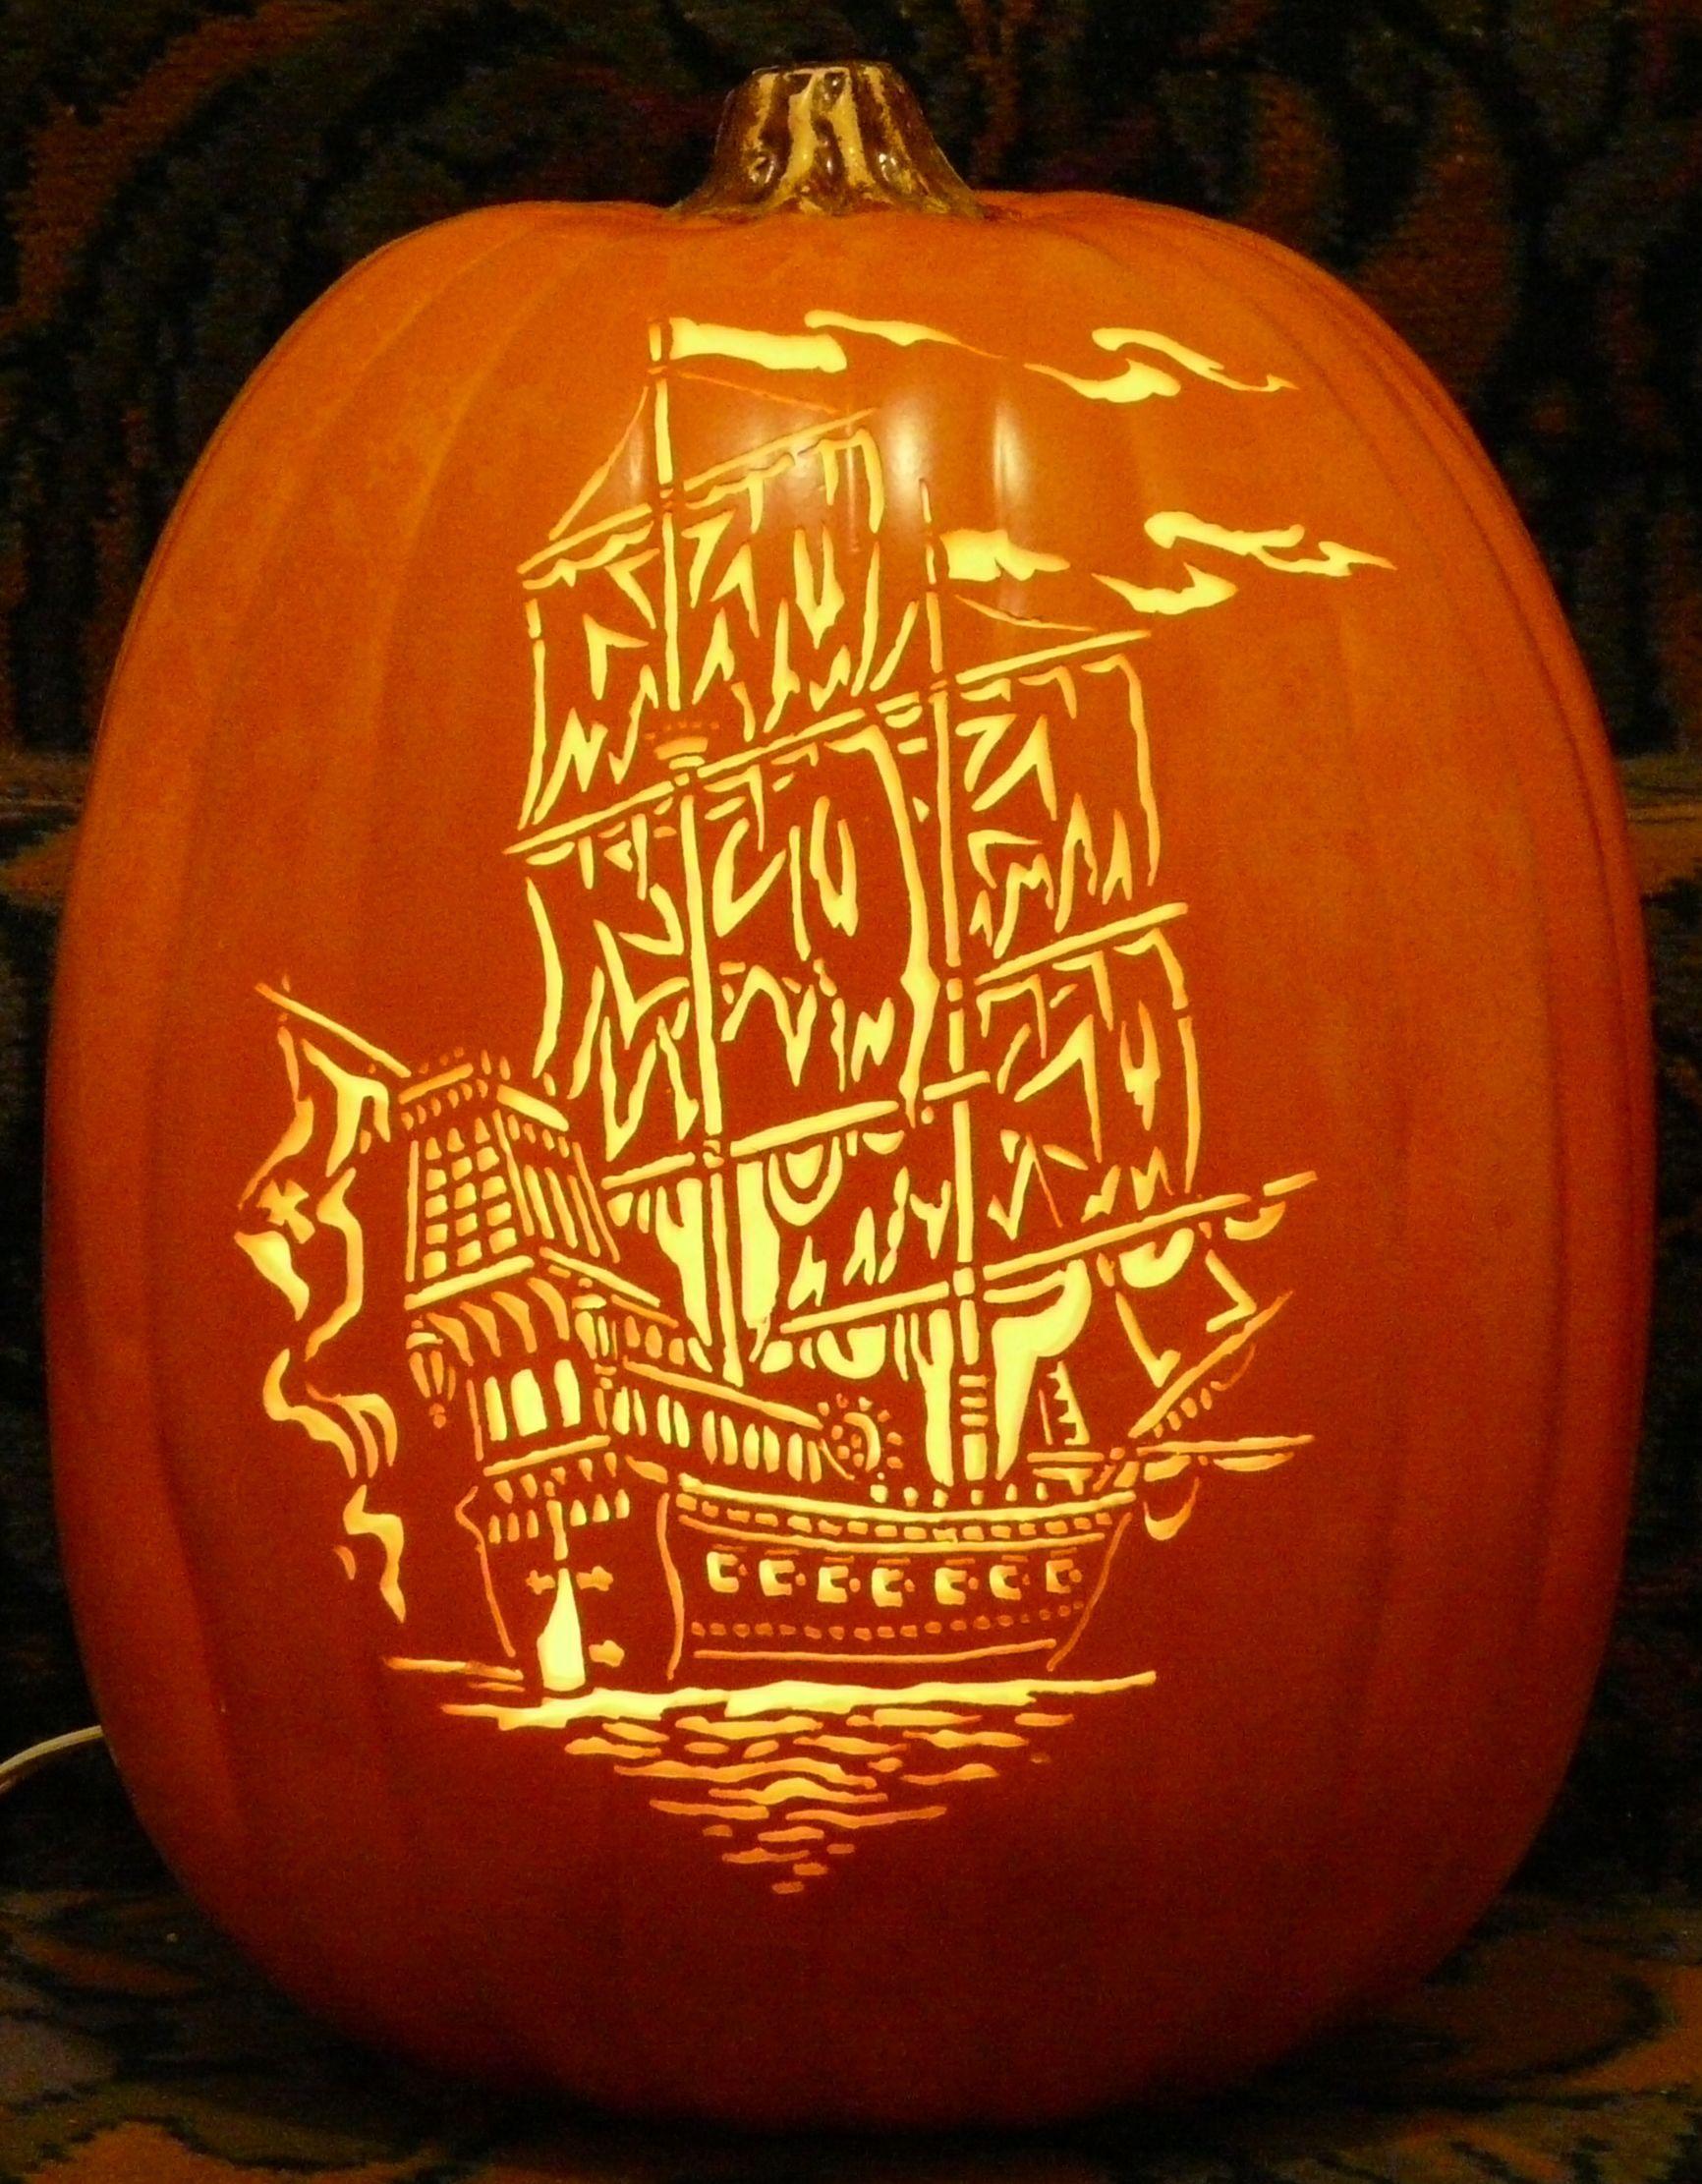 Ship scroll saw pattern I carved on a foam pumpkin